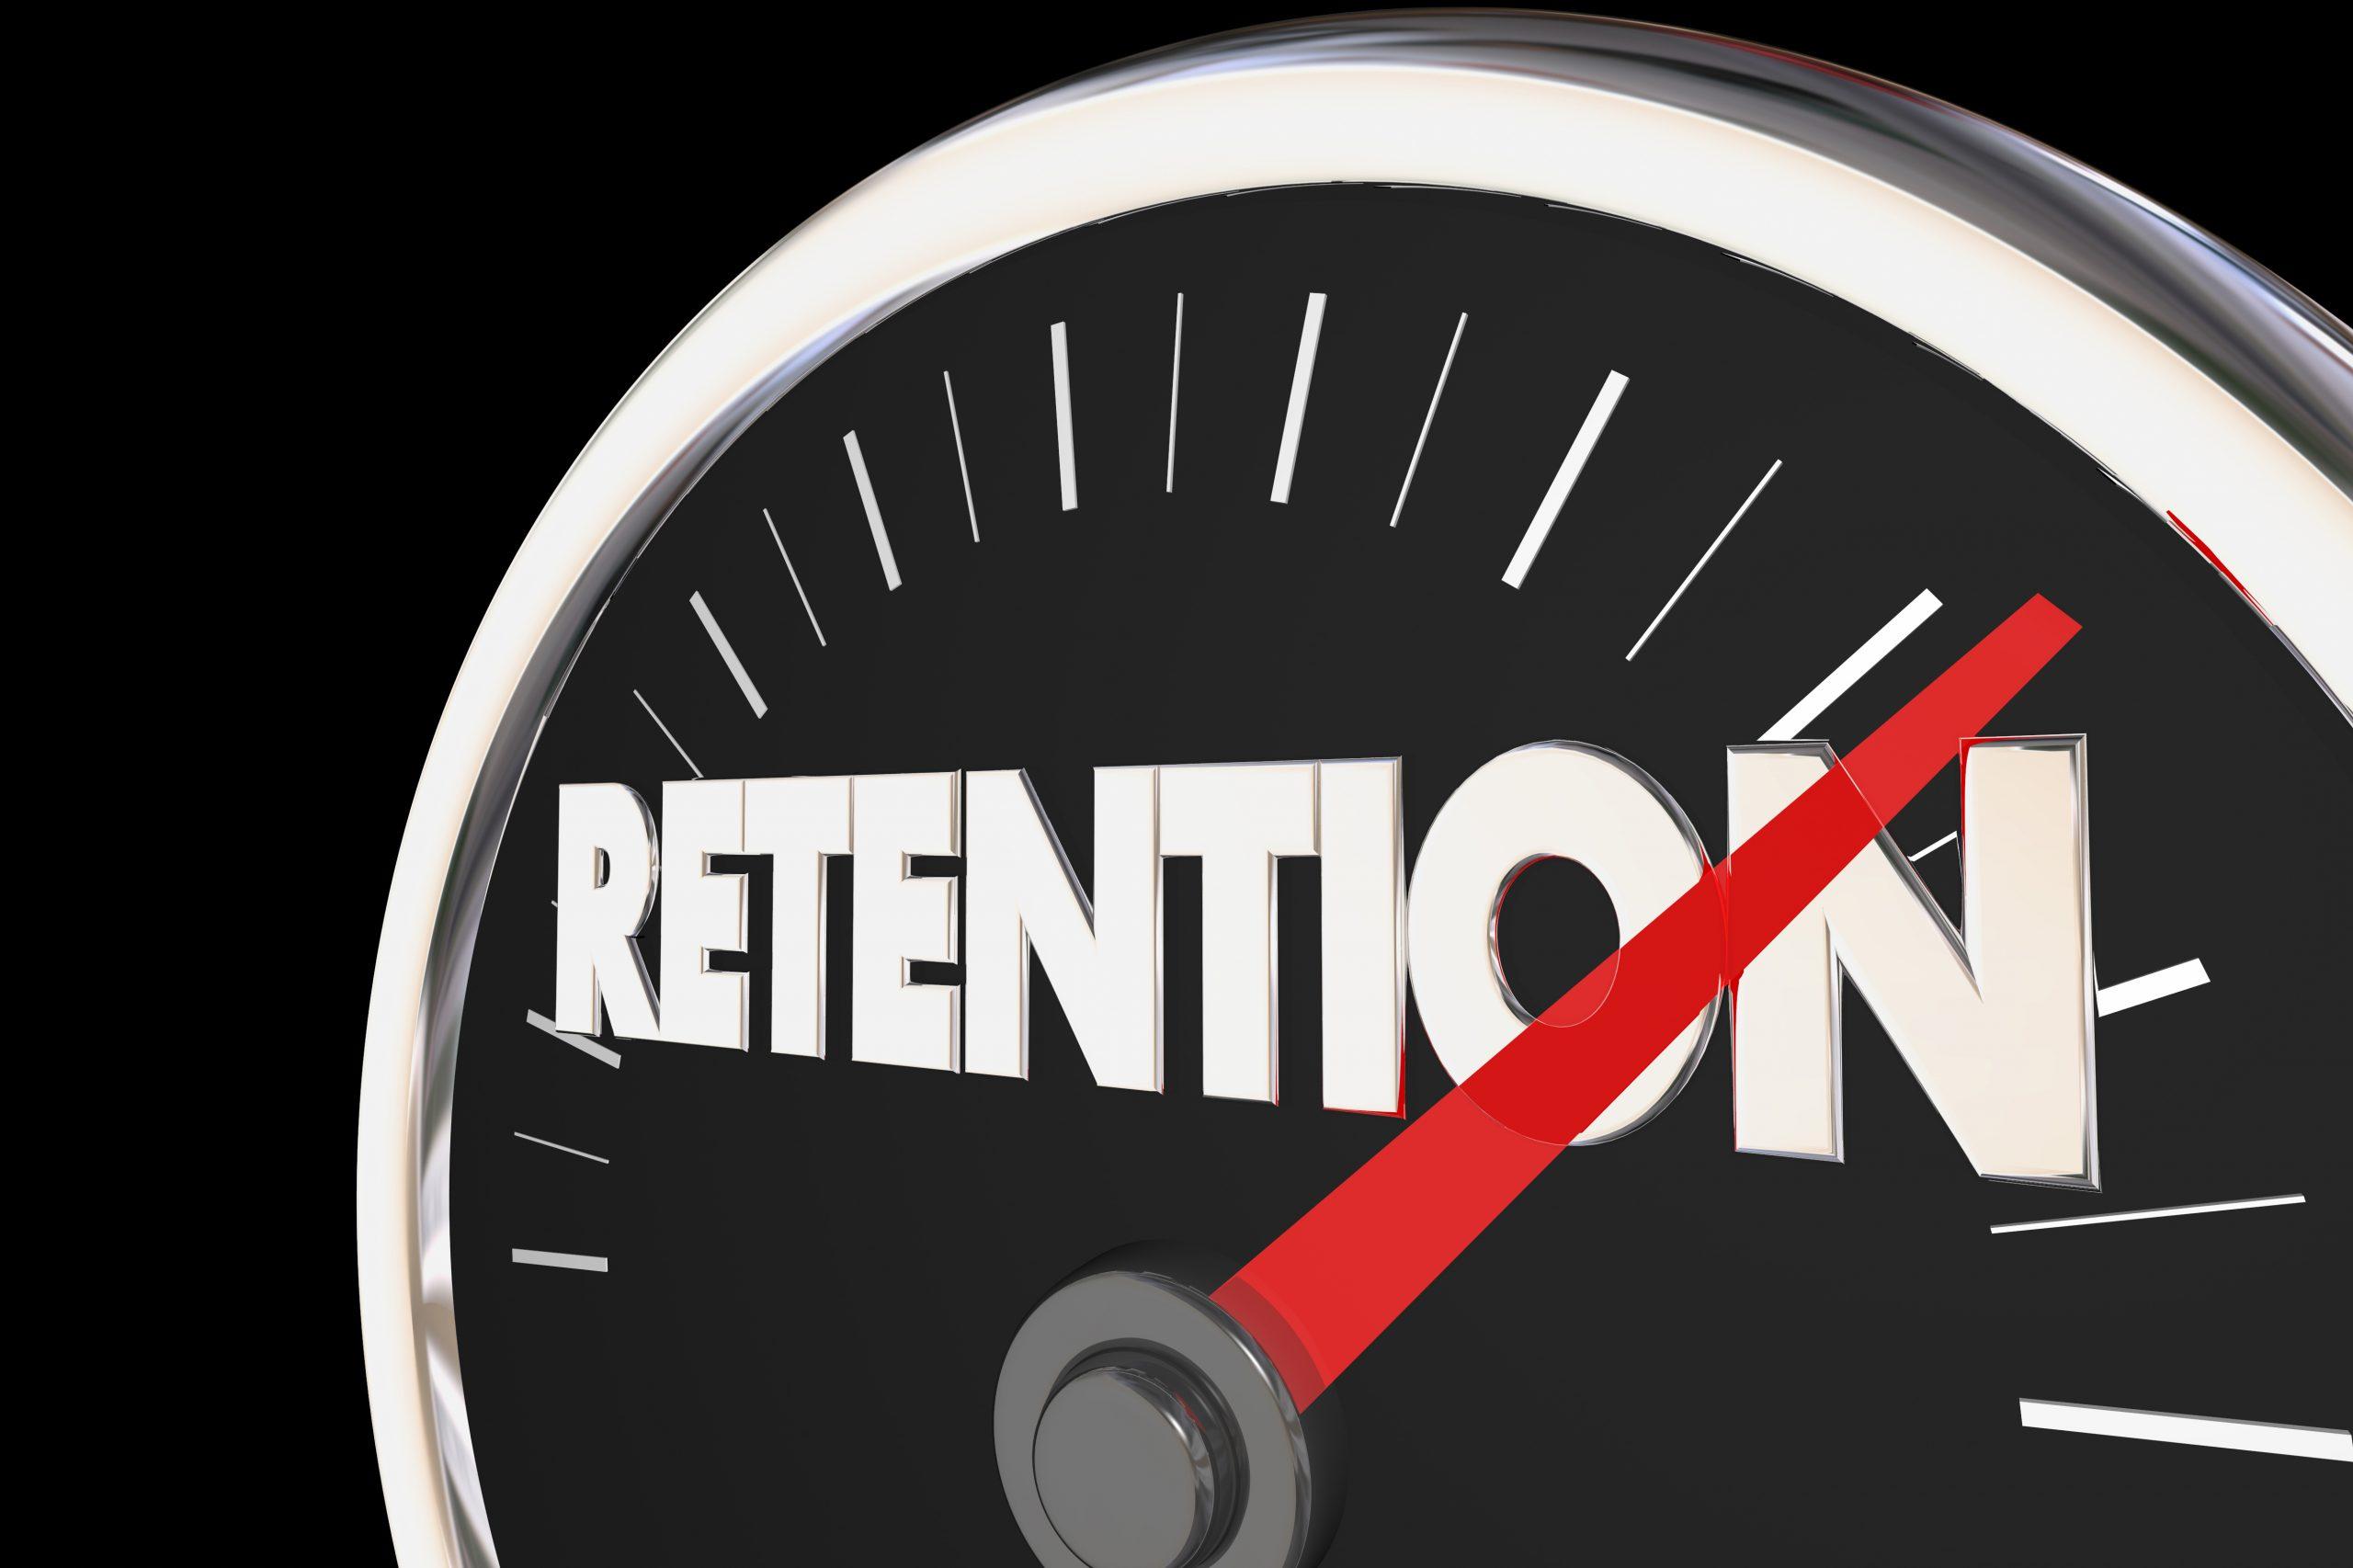 Retention Level Rising Improvement Speedometer 3d Illustration